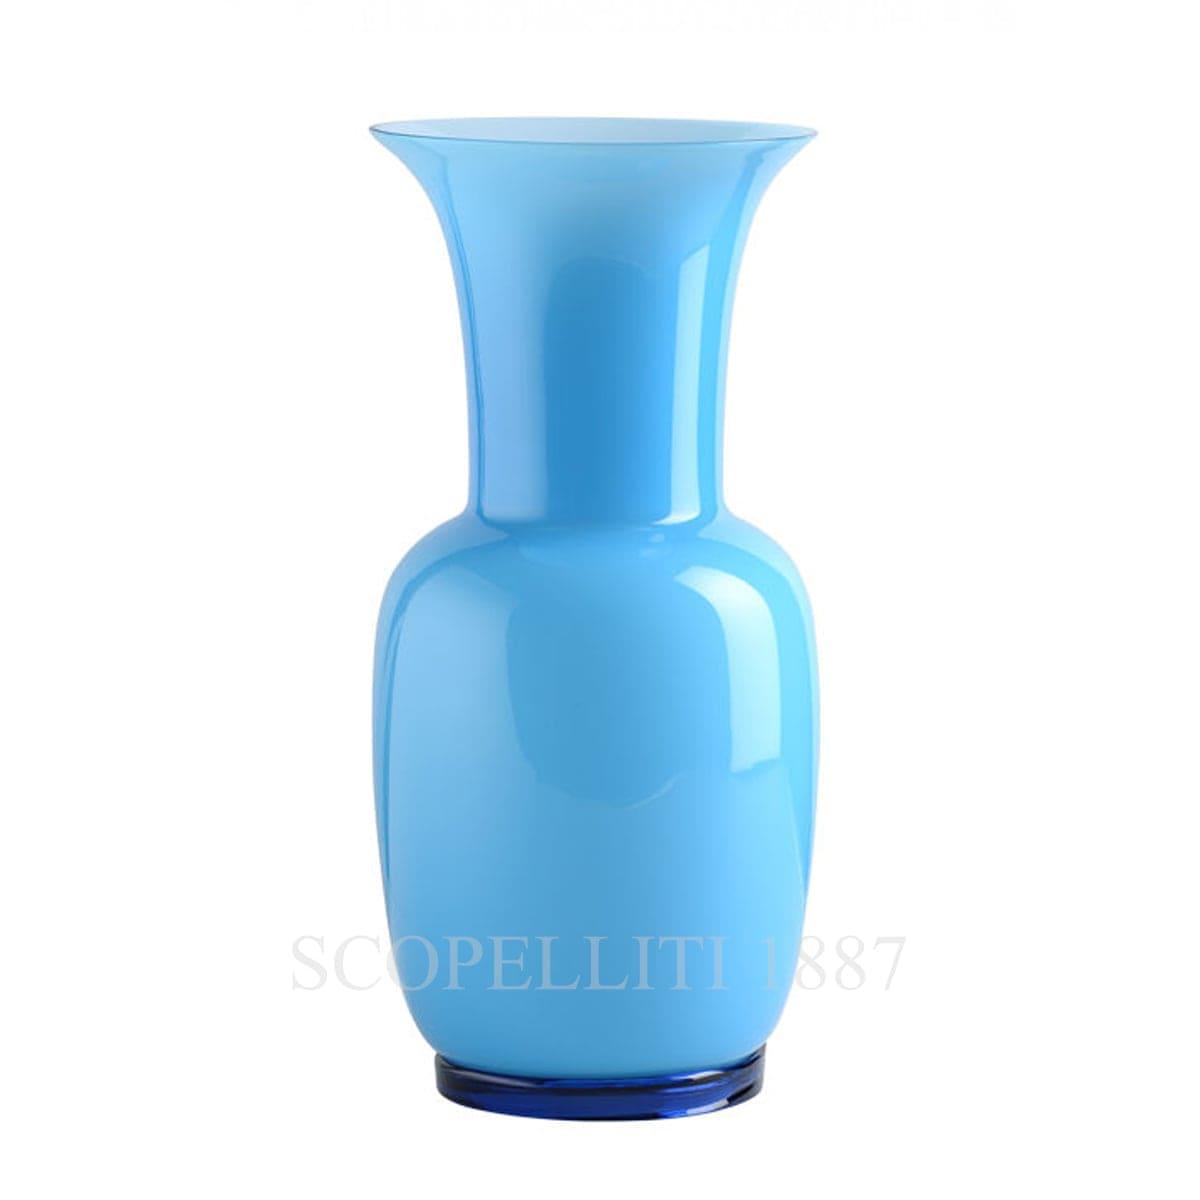 venini opaline italian murano glass vase turquoise